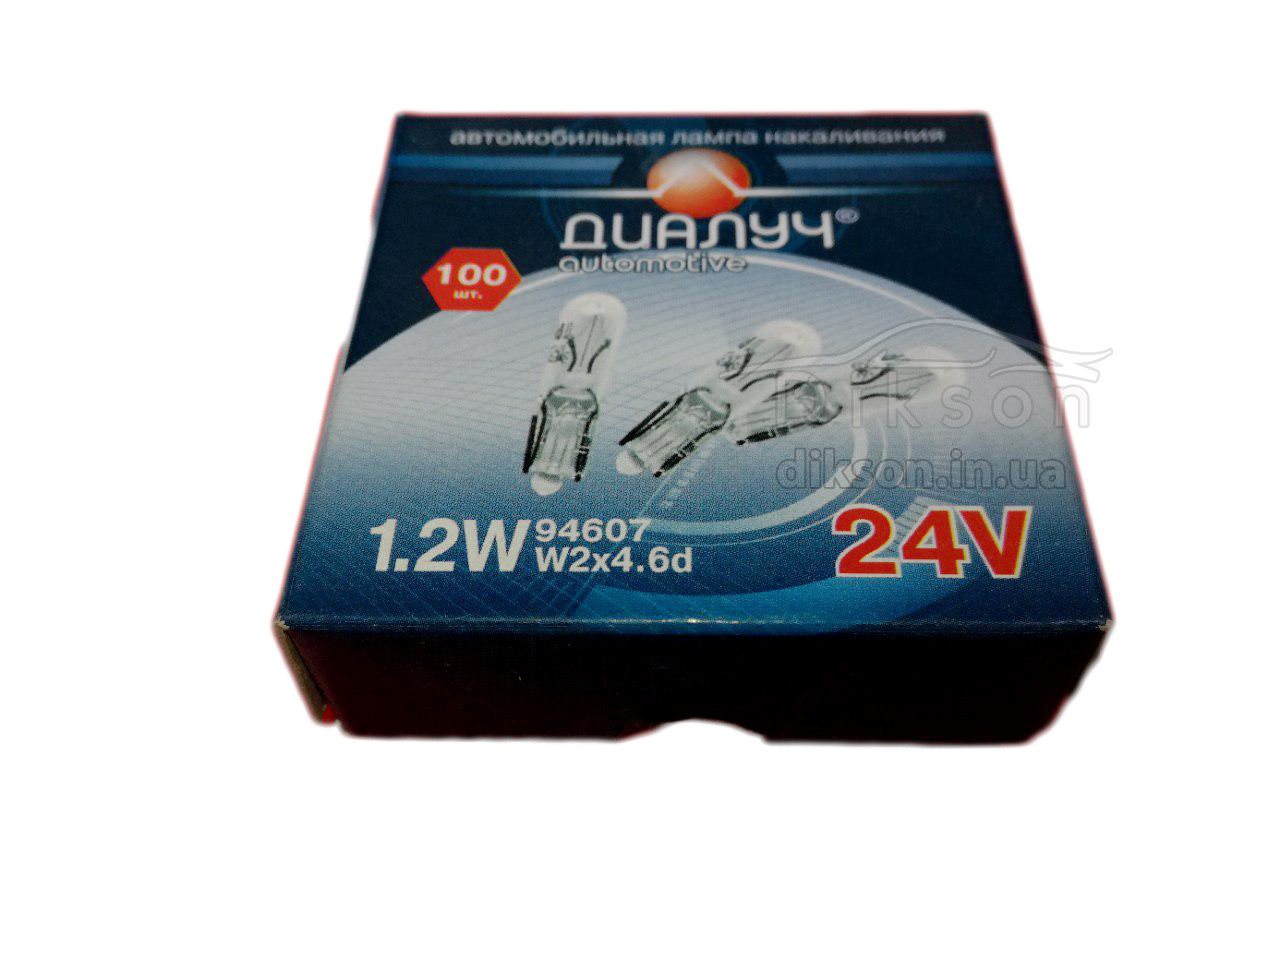 Лампочка Диалуч 24V 1,2W W2x4,6D